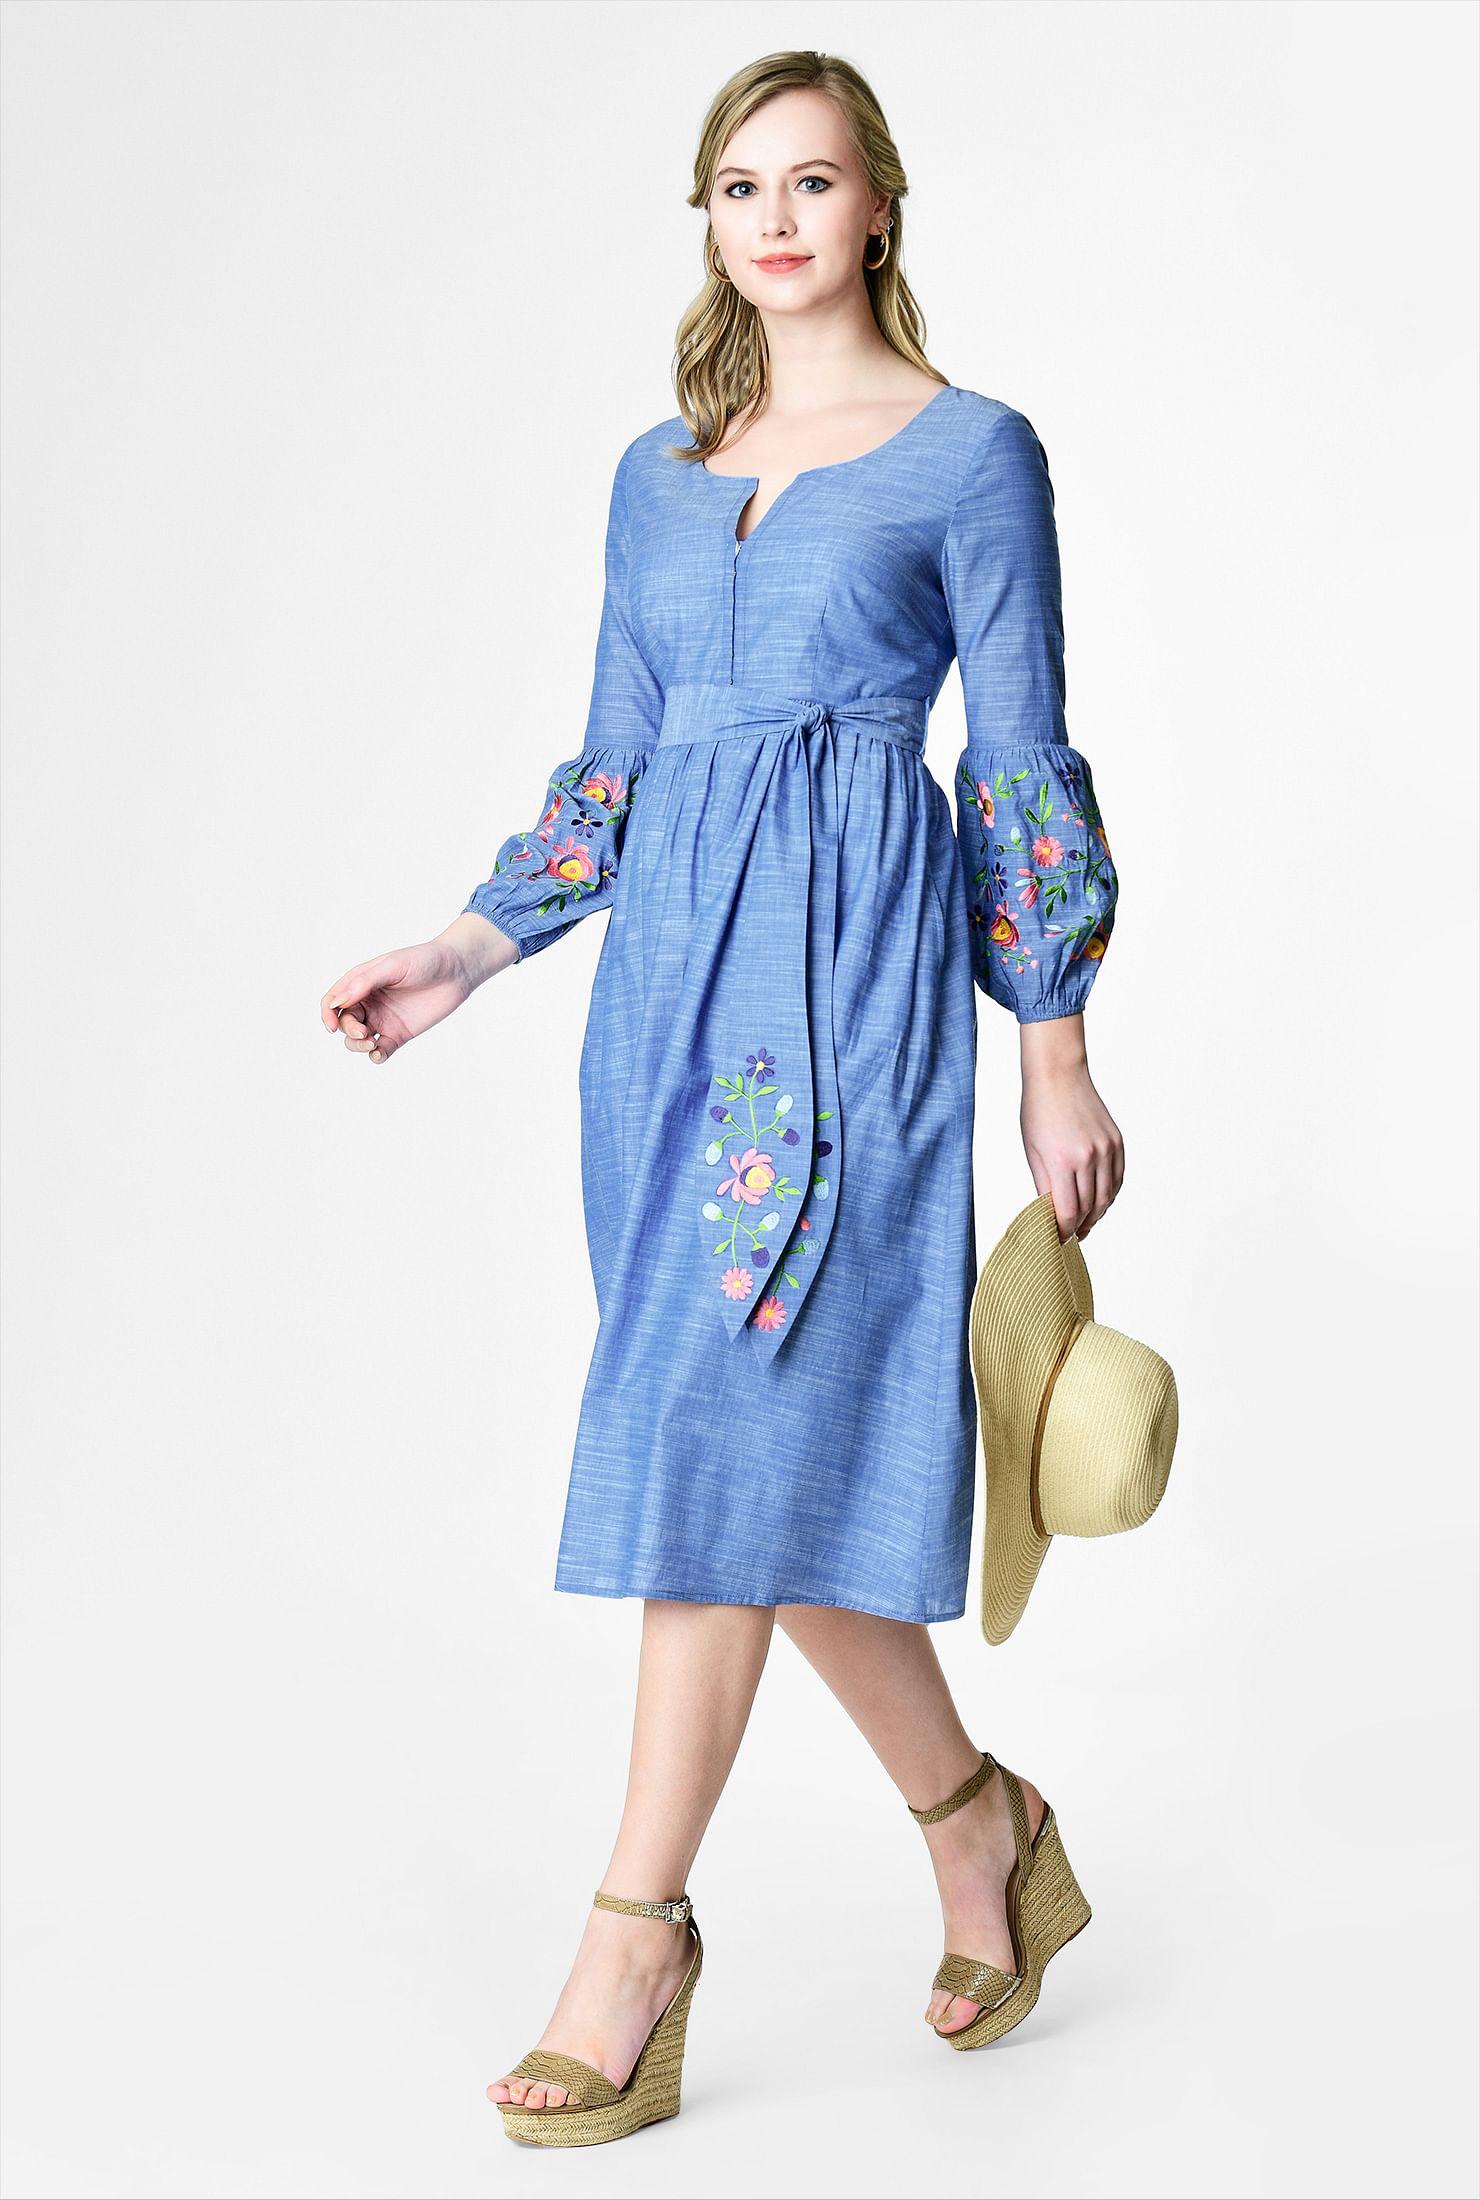 Floral embellished bishop sleeve cotton chambray dress